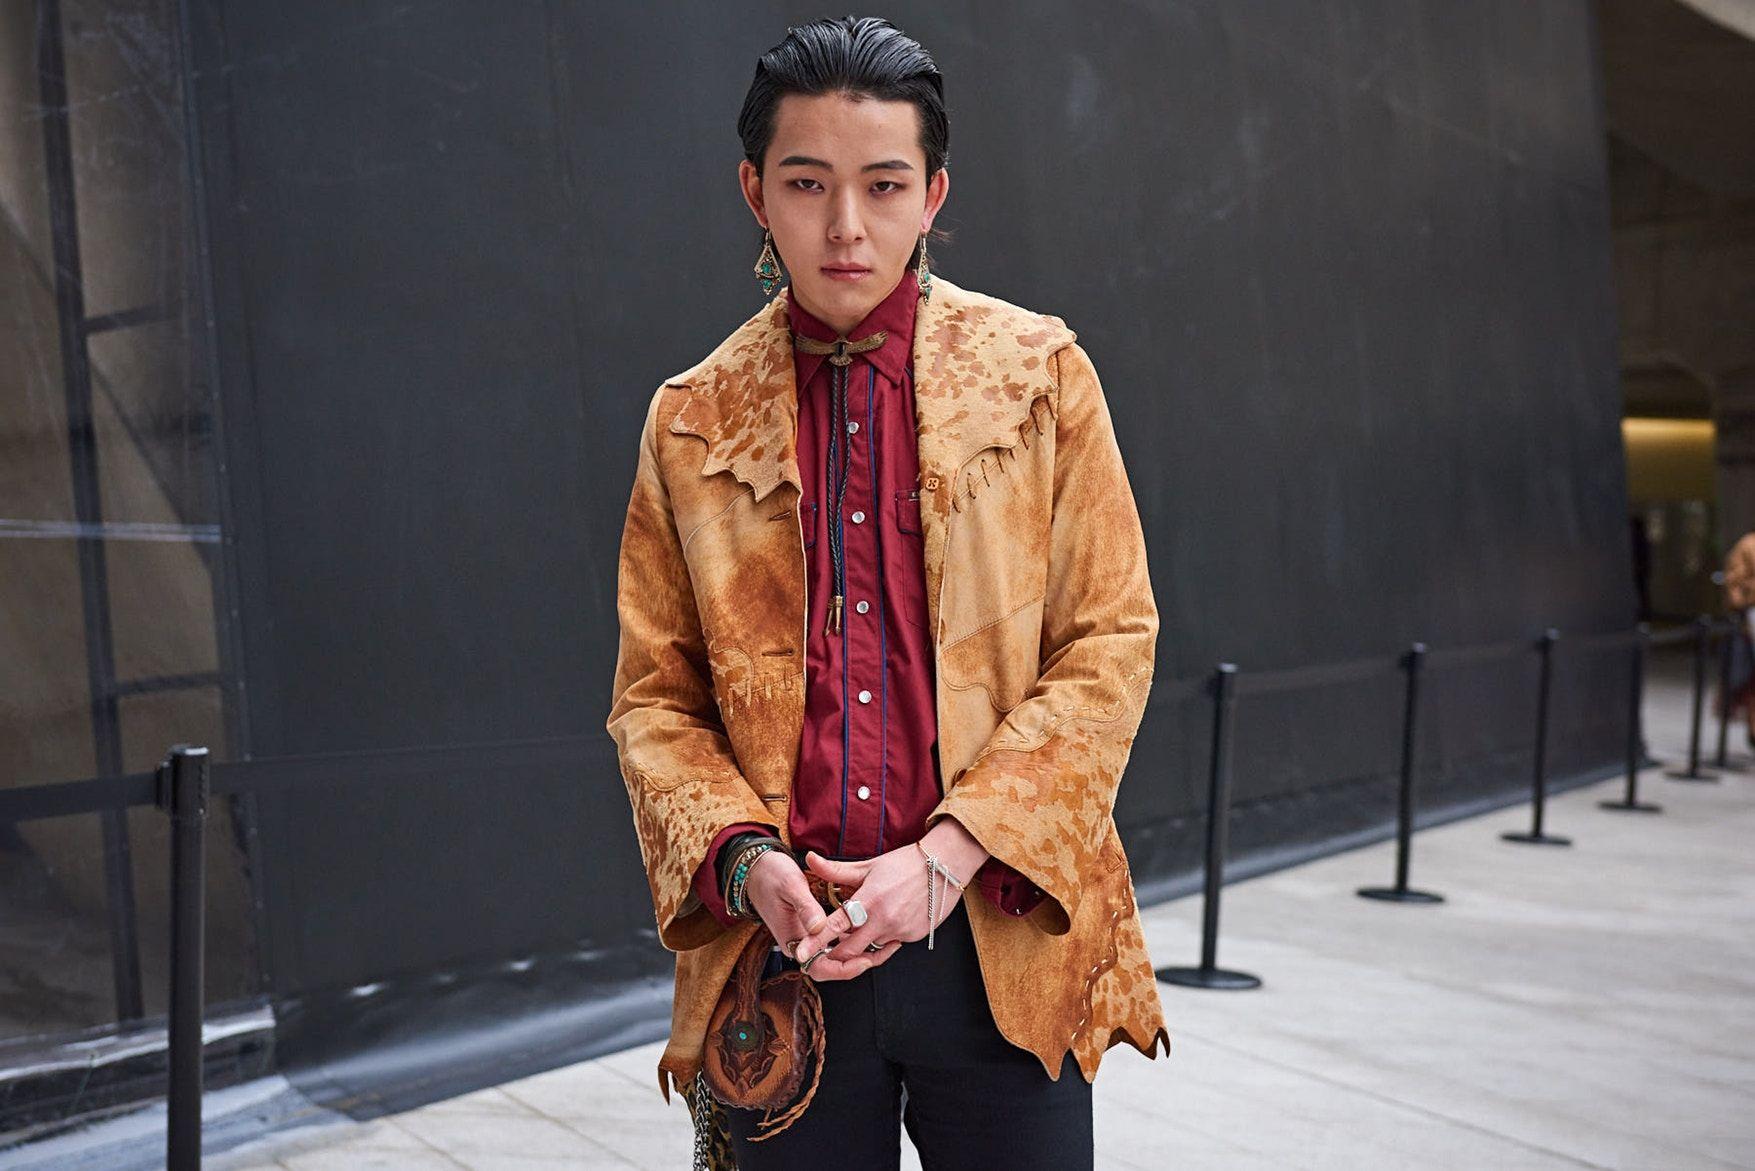 e72a9708366d Street Style Gets Bold at Seoul Fashion Week Fall/Winter 2018   衣著 ...